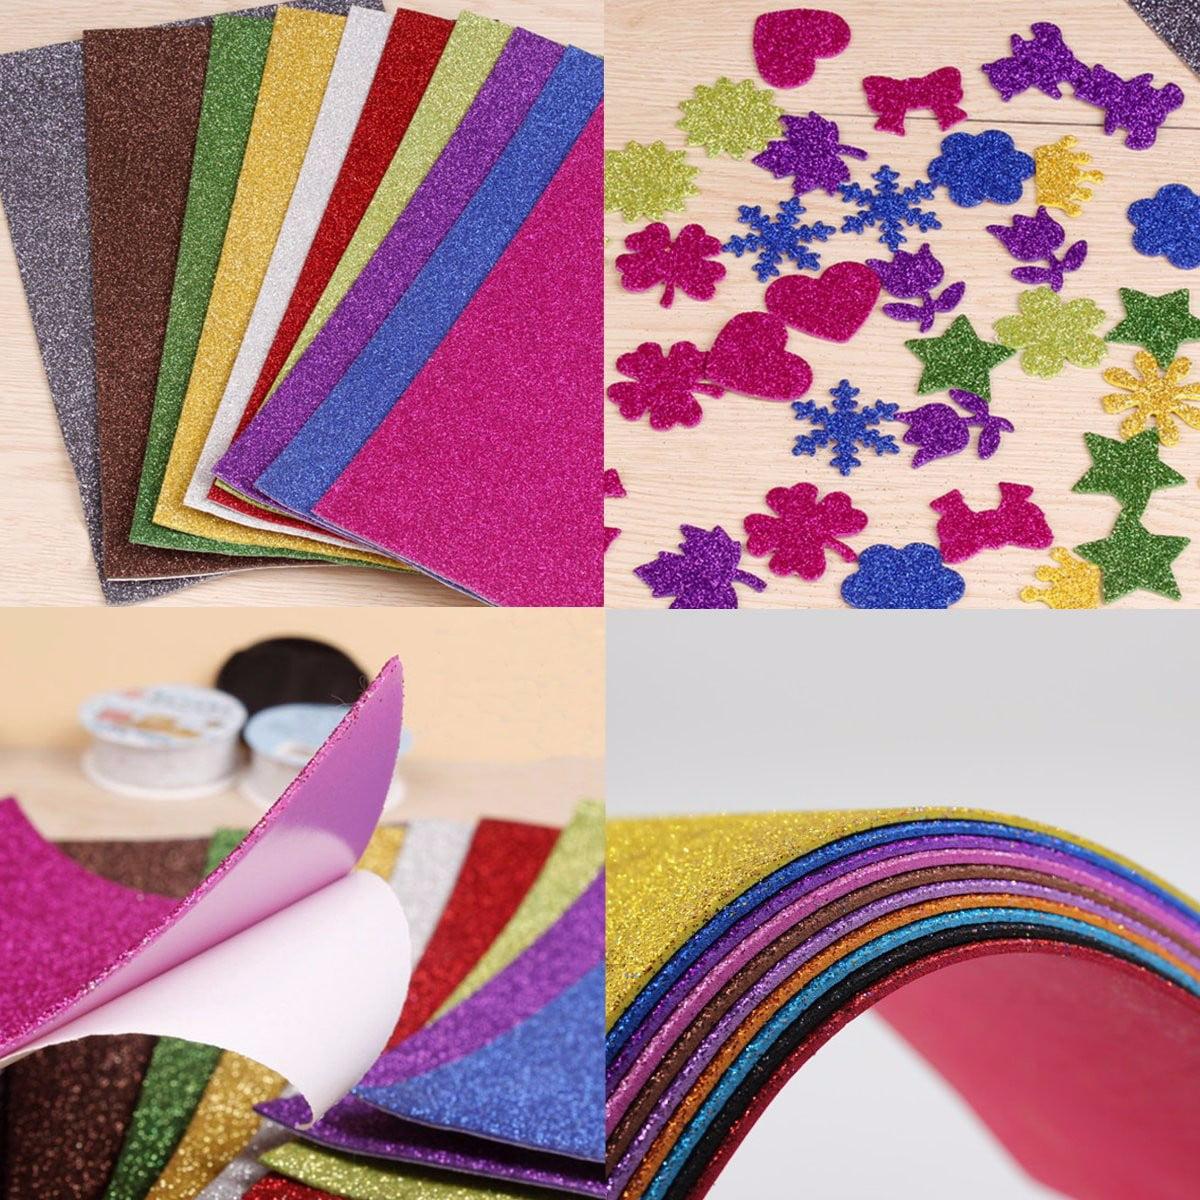 "10Pcs Adhesive Glitter Scrapbooking Paper Vinyl Sticker Art SHeets Craft 8x12"" by"